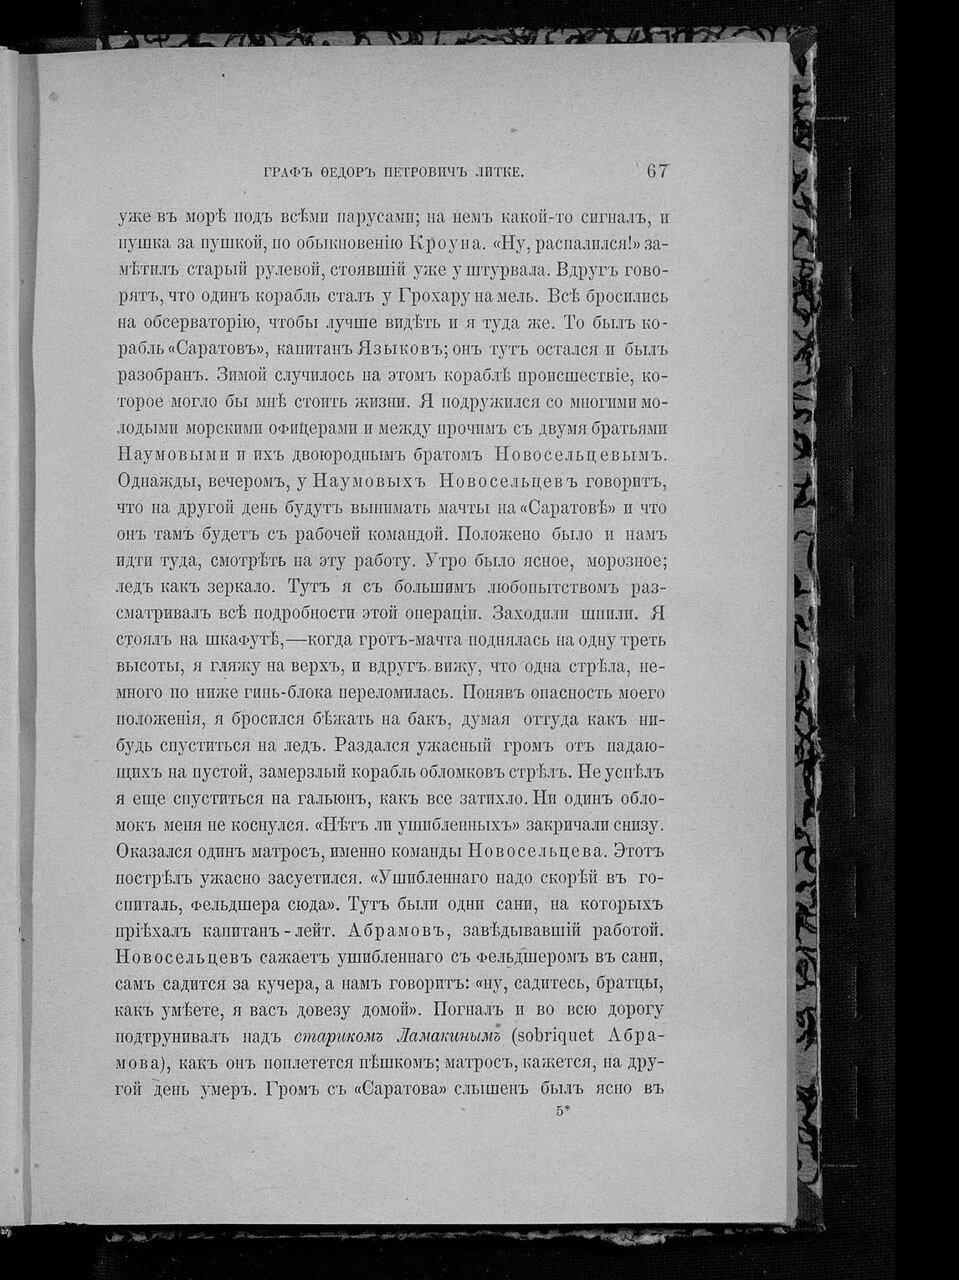 https://img-fotki.yandex.ru/get/483372/199368979.d4/0_21dde4_7ebe7fa2_XXXL.jpg